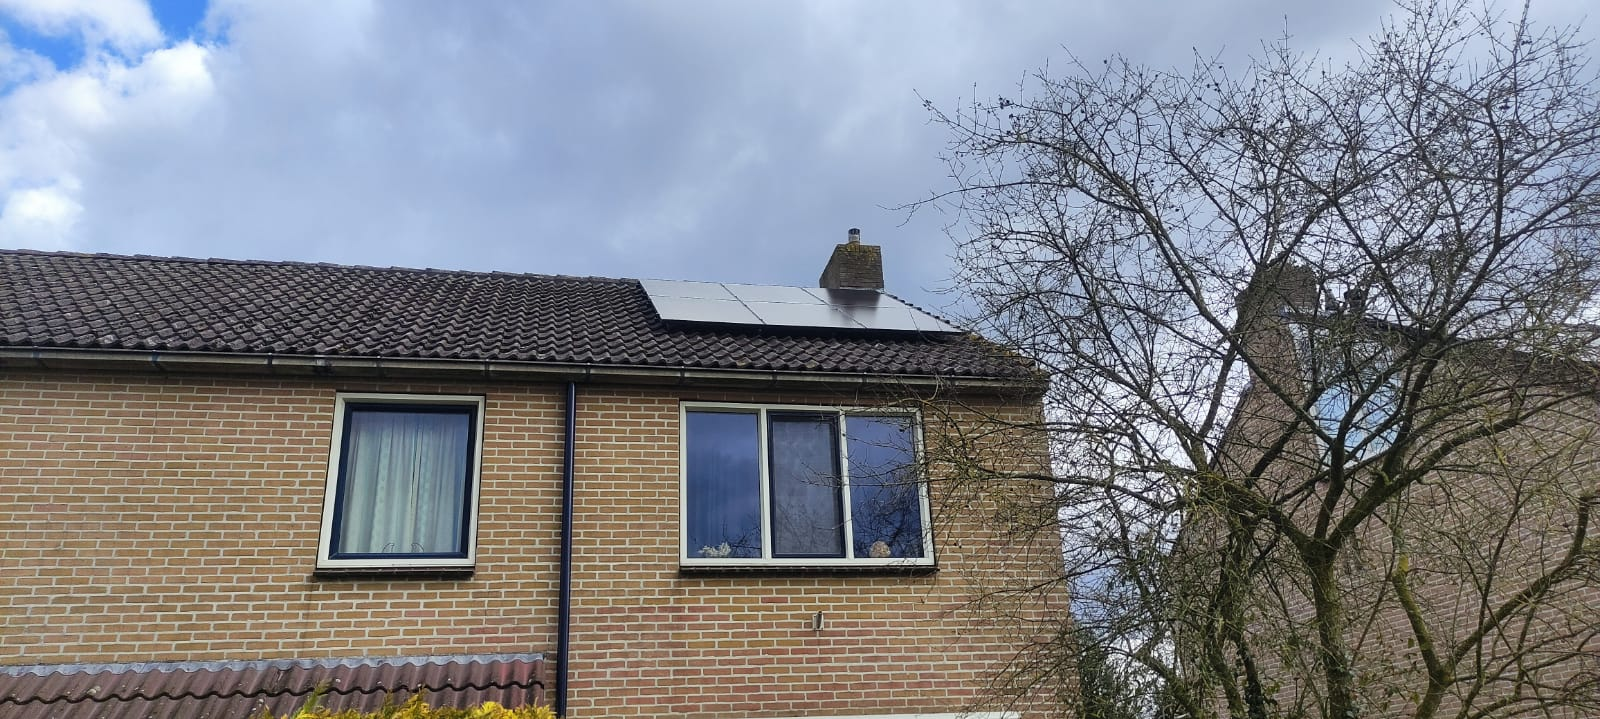 SolarWatt black edition glas glas zonnepanelen Hardenberg